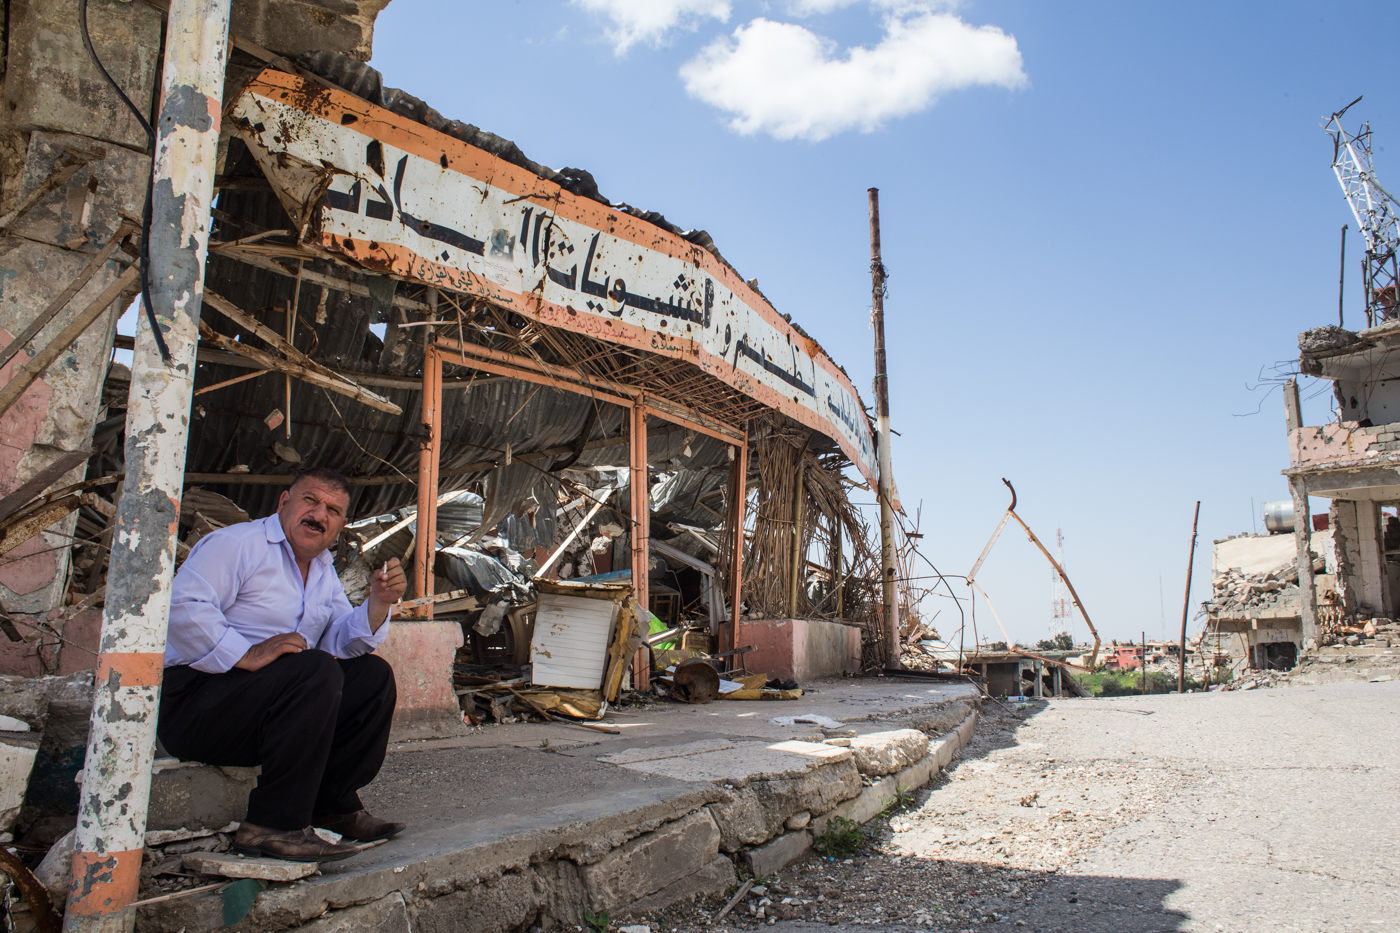 Giacomo_Sini_Italy_The_forgotten_people_of_Kurdistan_18.jpg